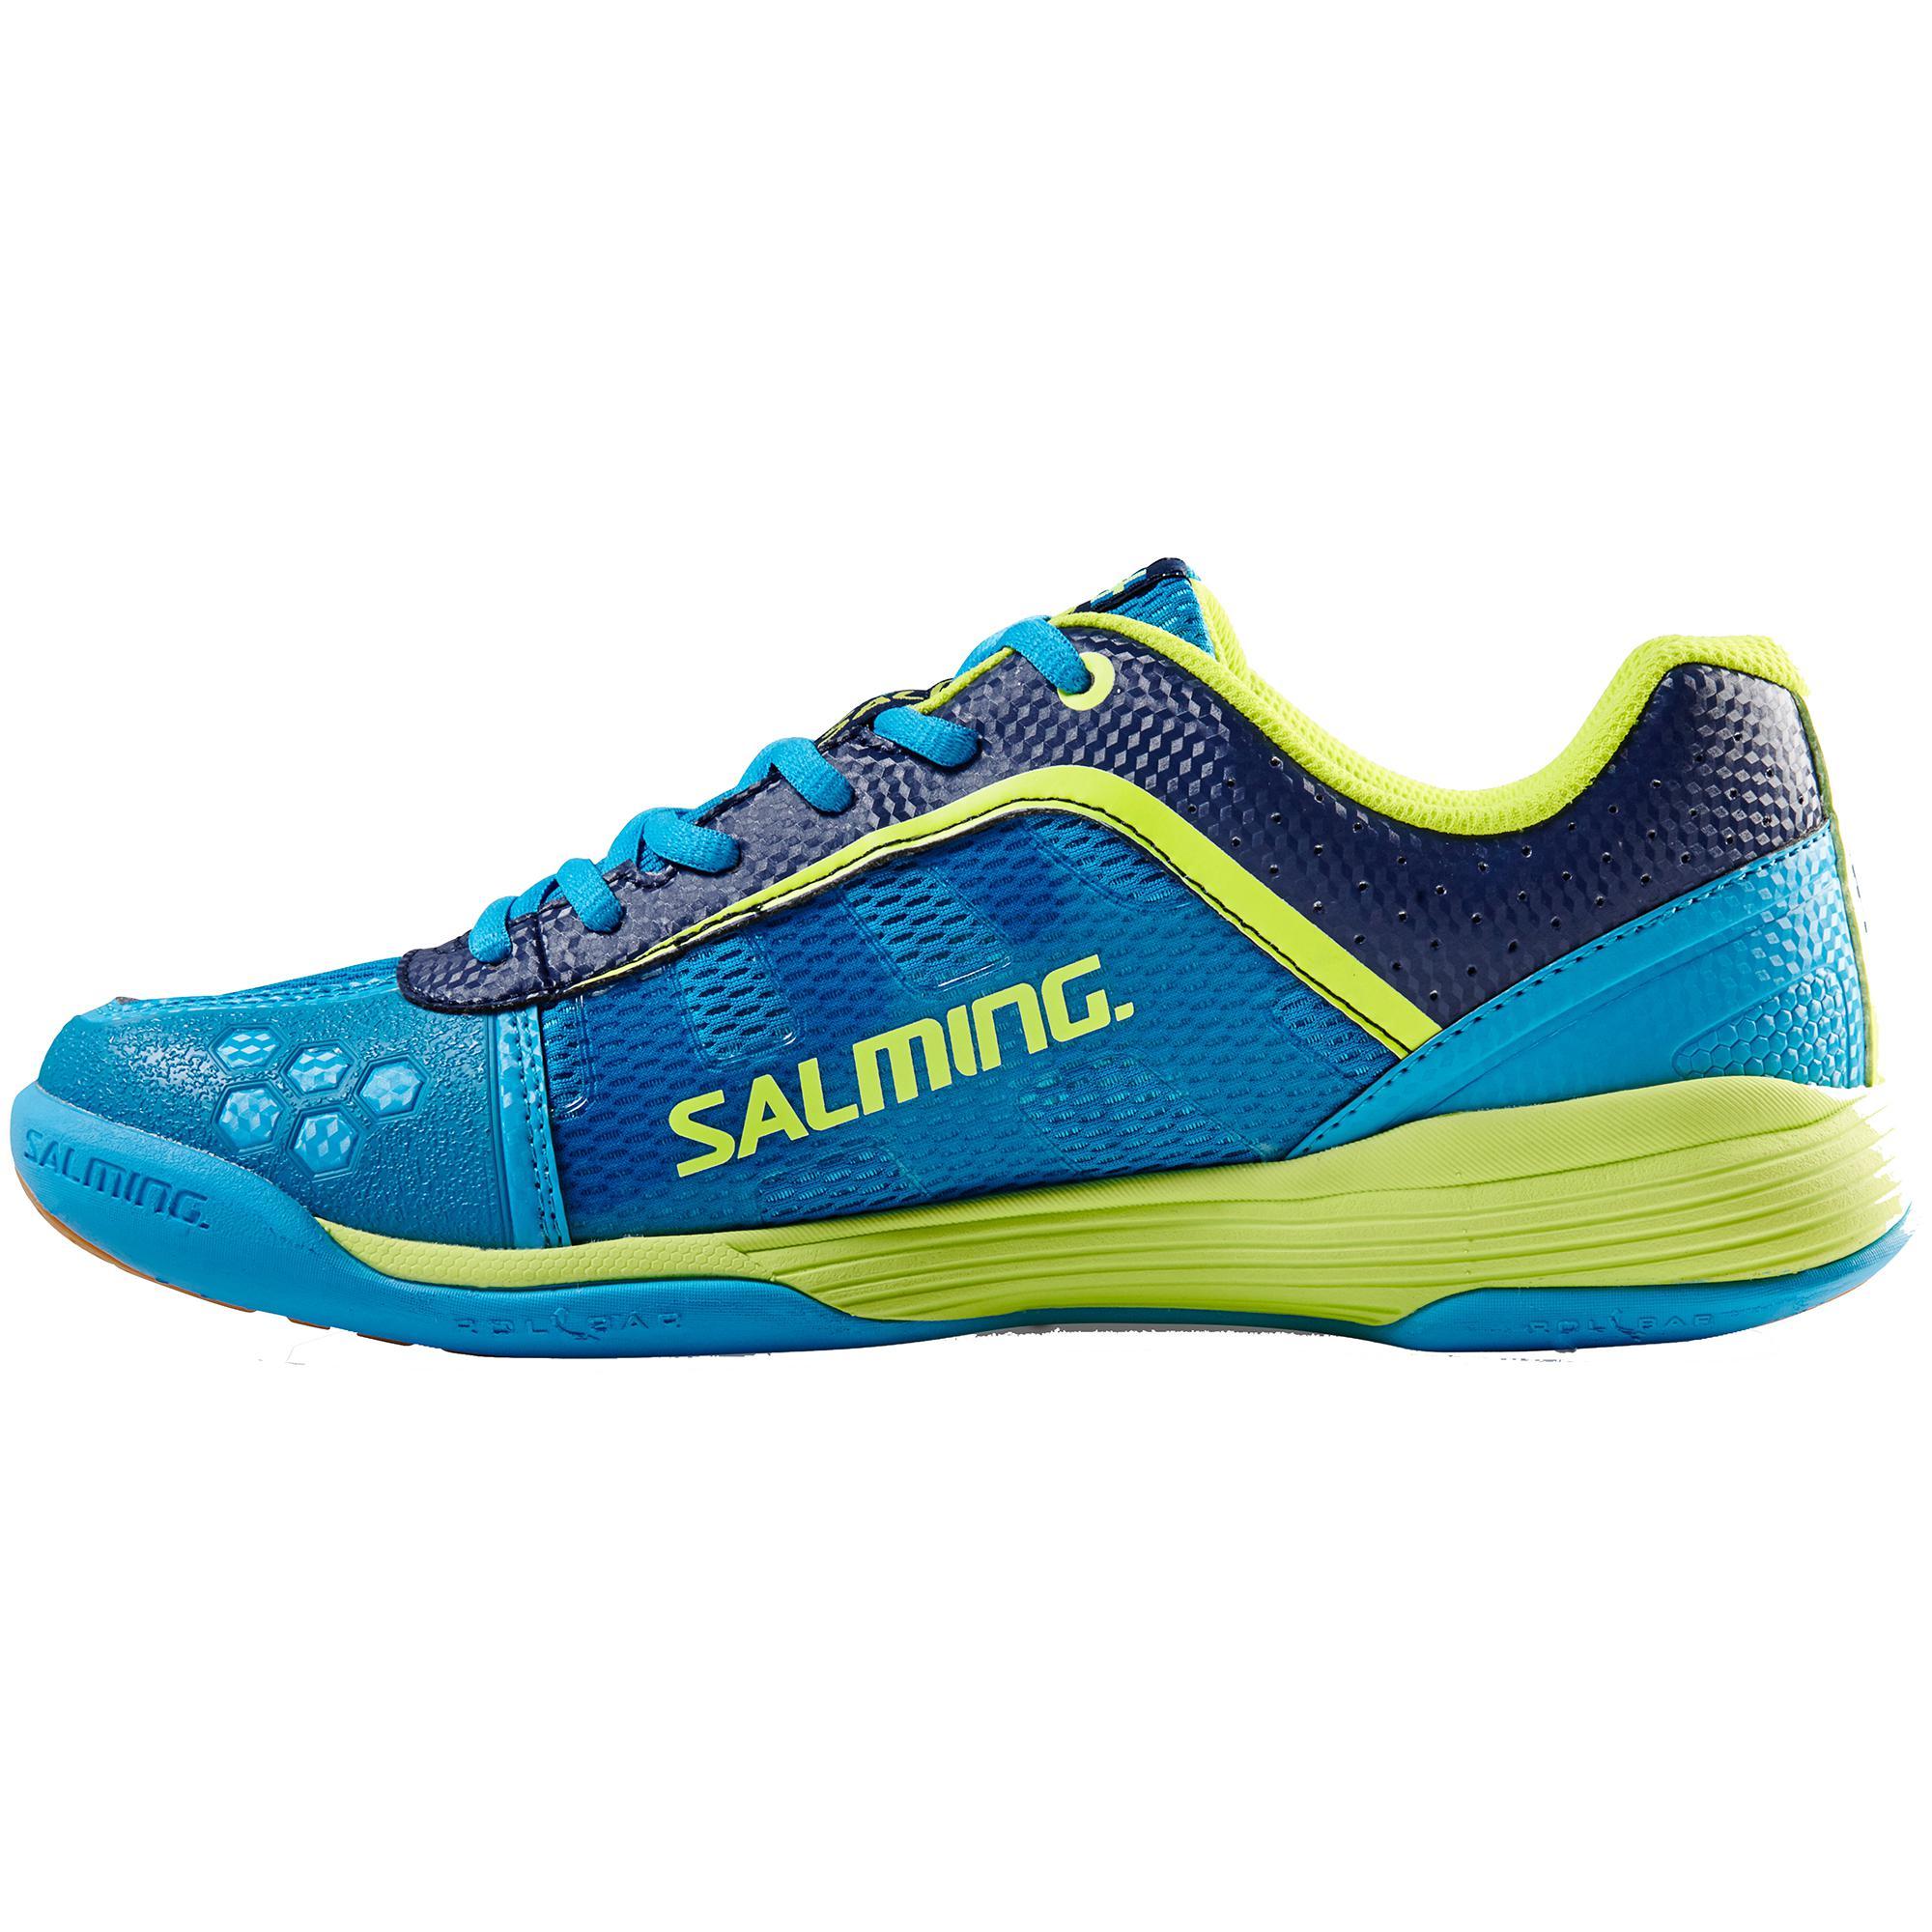 Salming Mens Adder Indoor Court Shoes - Cyan/Yellow